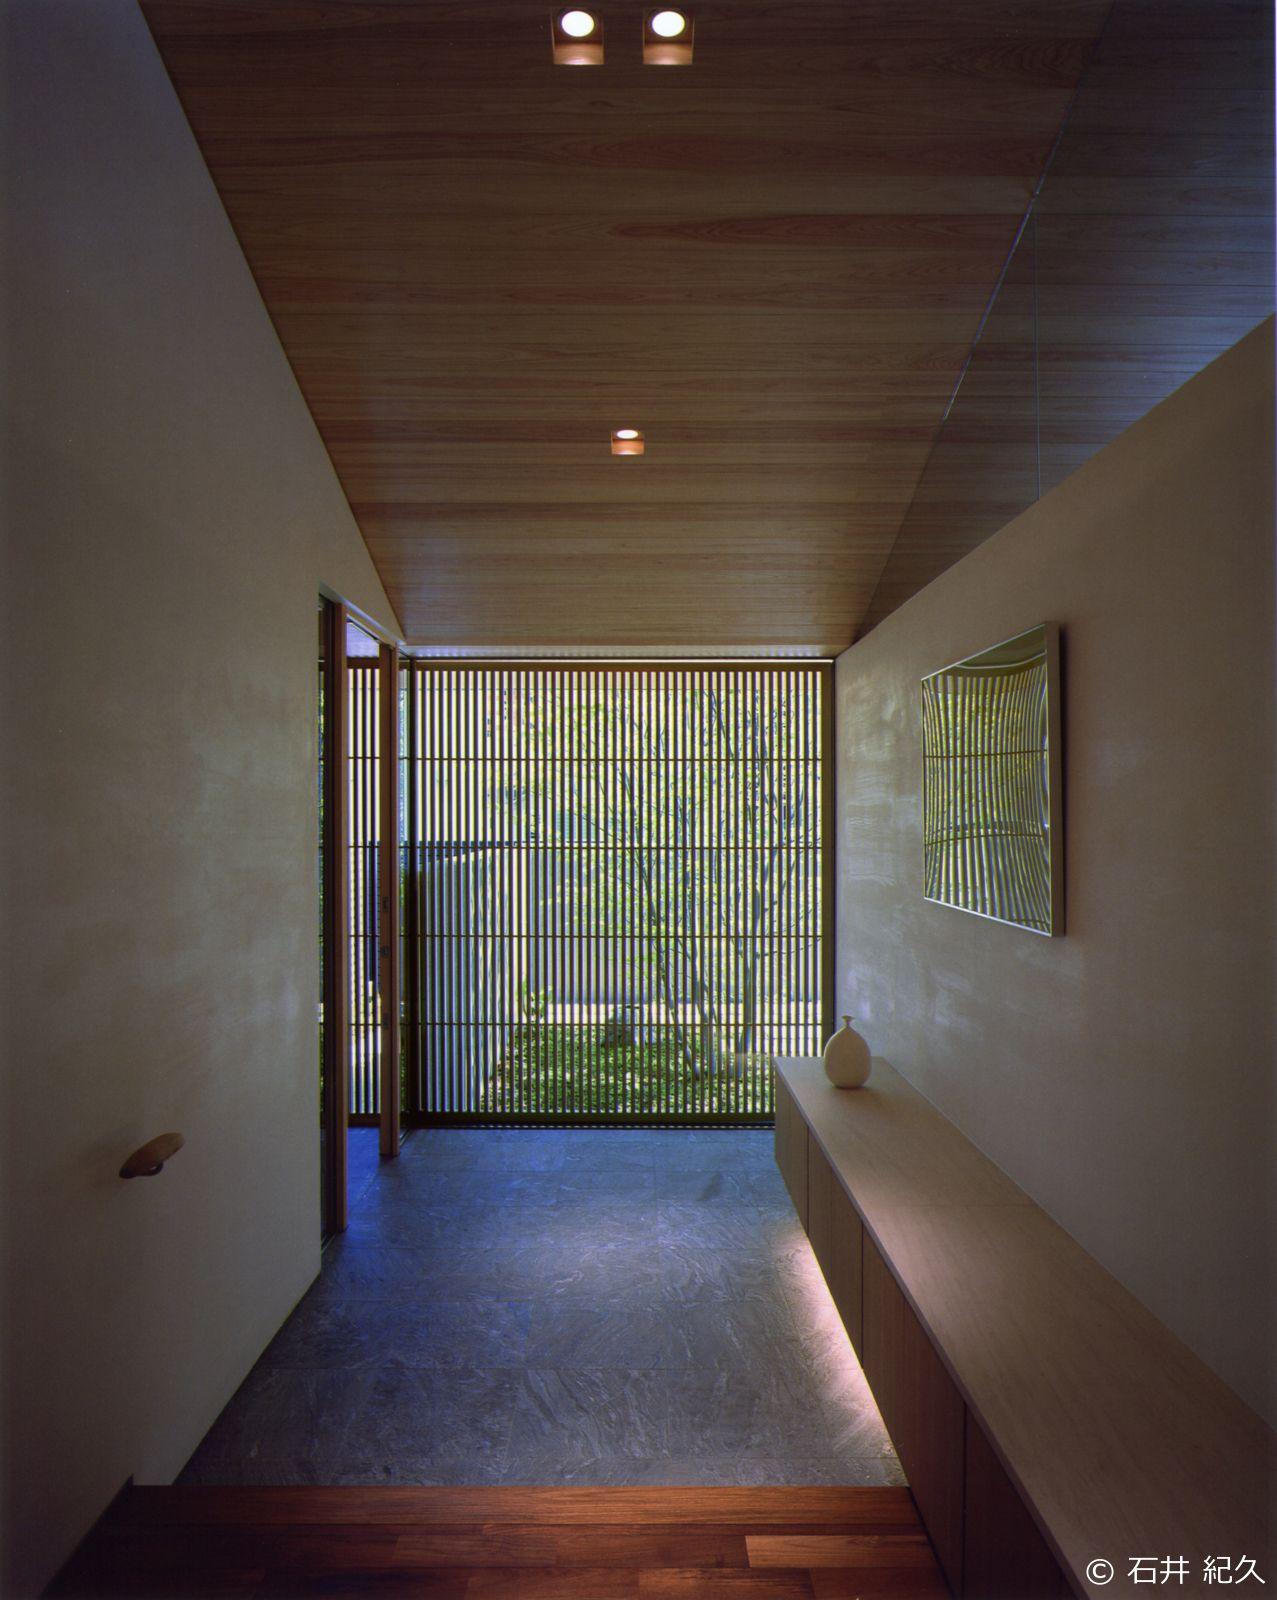 U201c家づくりを楽しもうu201d 住まいの写真で人をつなぐ新感覚 · Contemporary HousesInterior ...